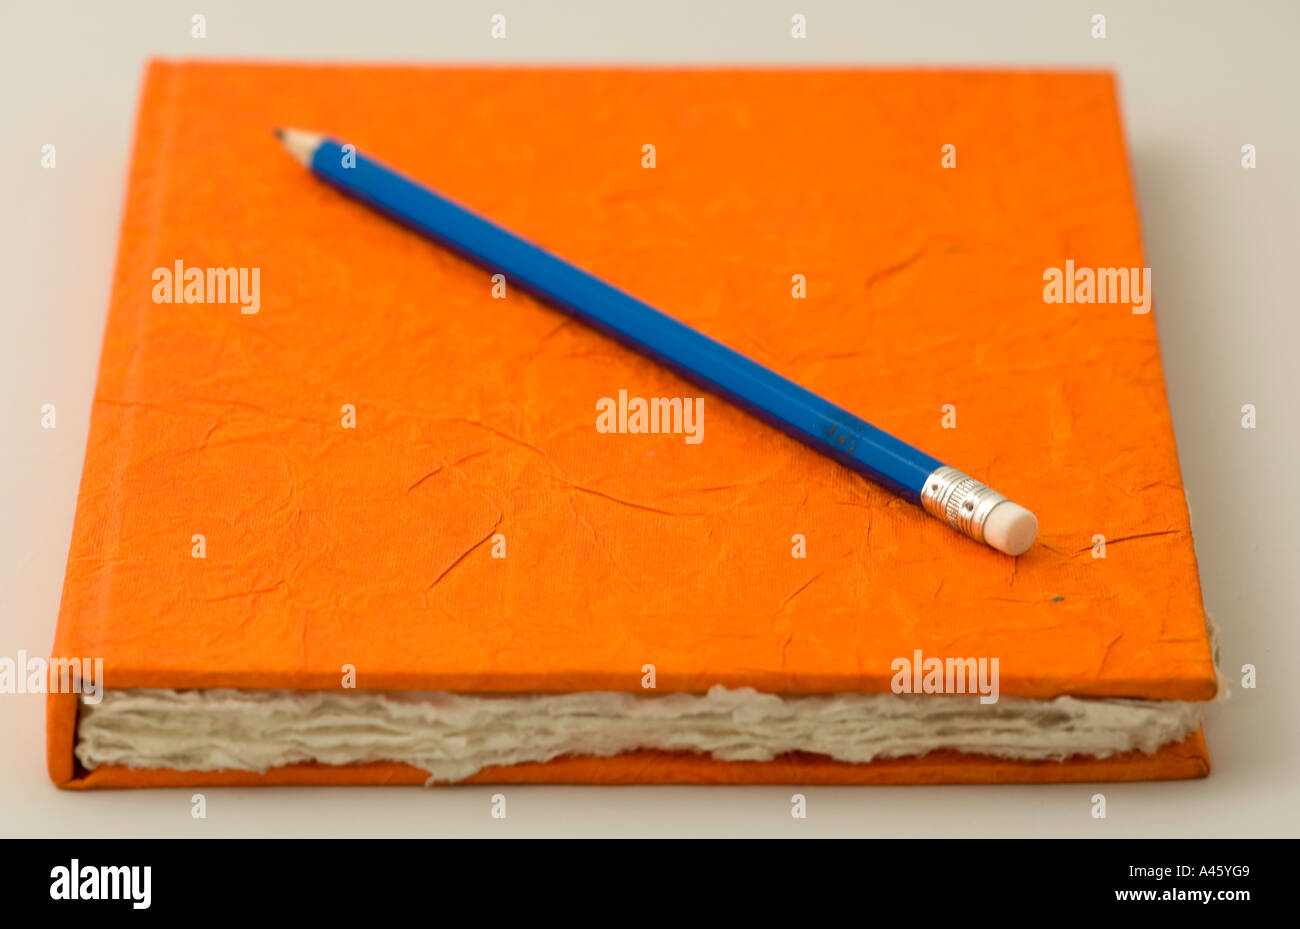 Album Orange et crayon Photo Stock